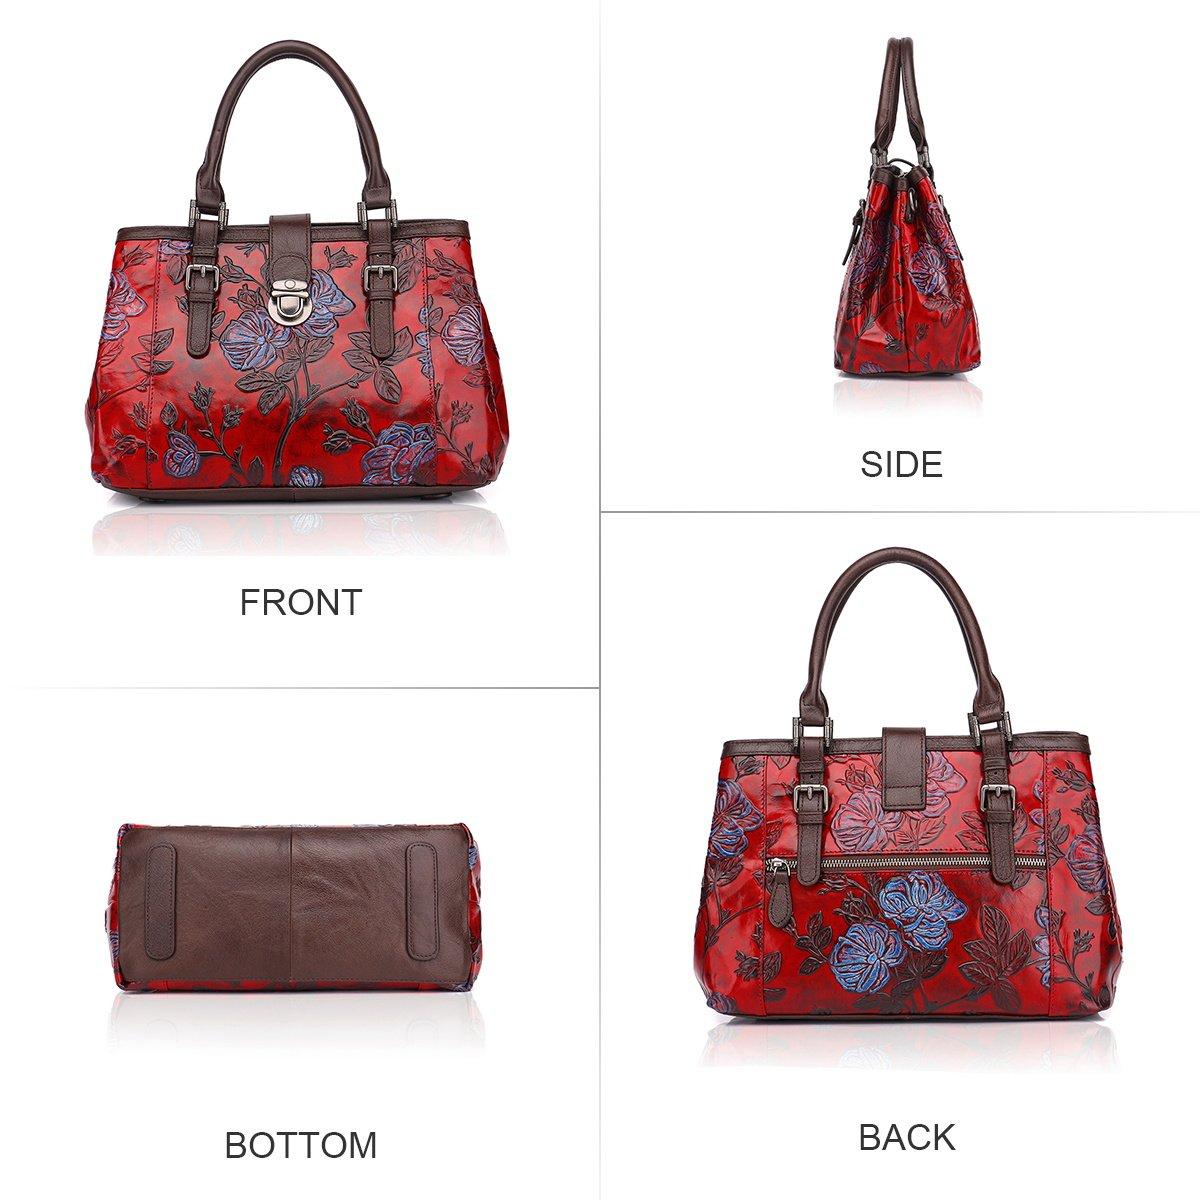 2e67d30fb286 APHISON Designer Unique Embossed Floral Cowhide Leather Tote Style Ladies  Top Handle Bags Handbags C817